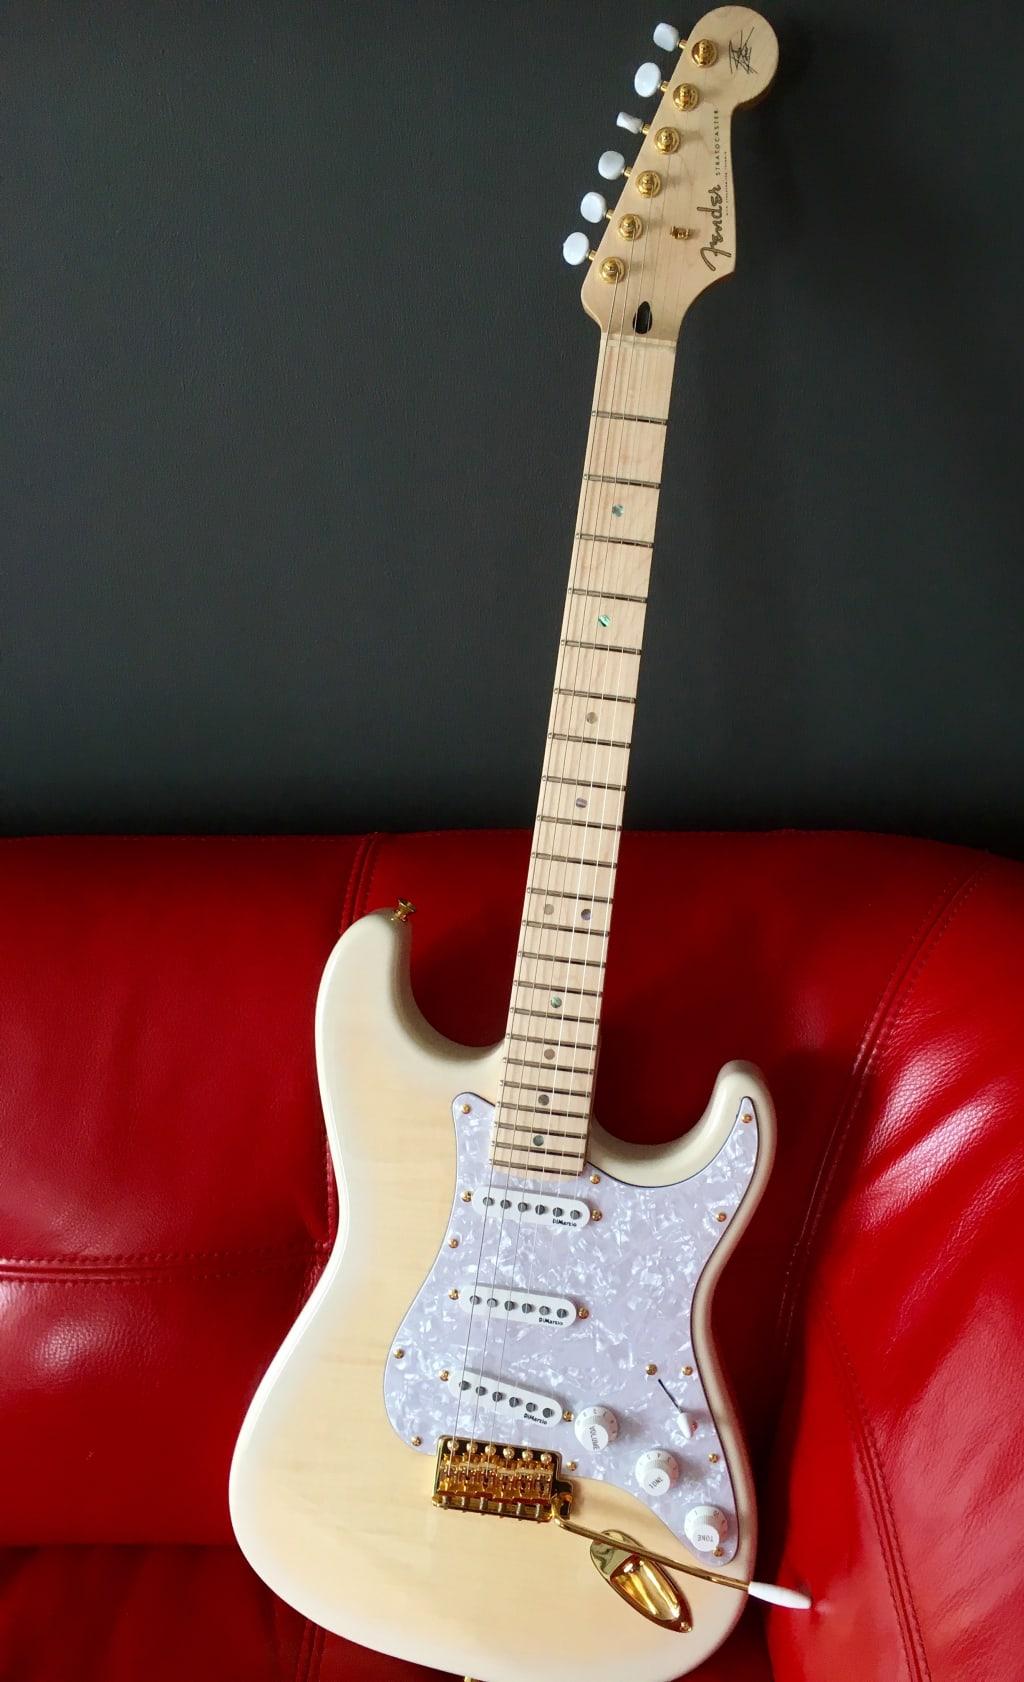 Fender Richie Kotzen Signature Strat